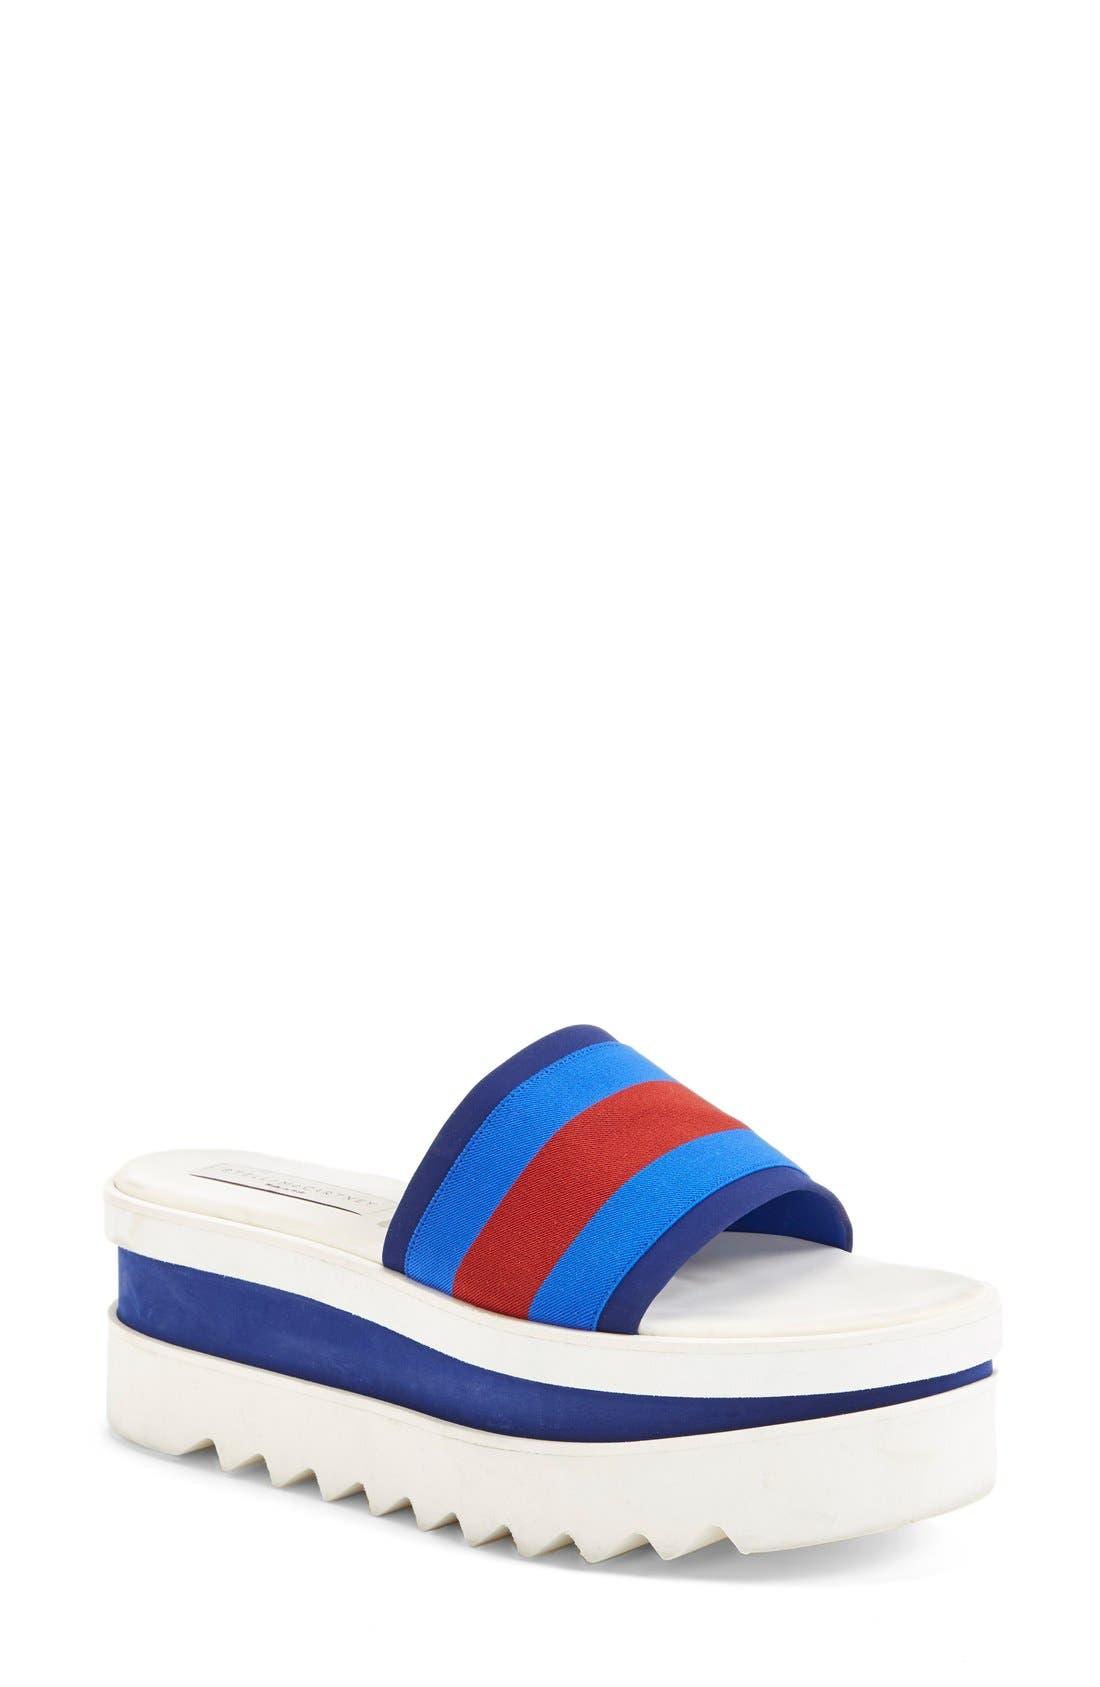 Alternate Image 1 Selected - Stella McCartney Platform Slide Sandal (Women)